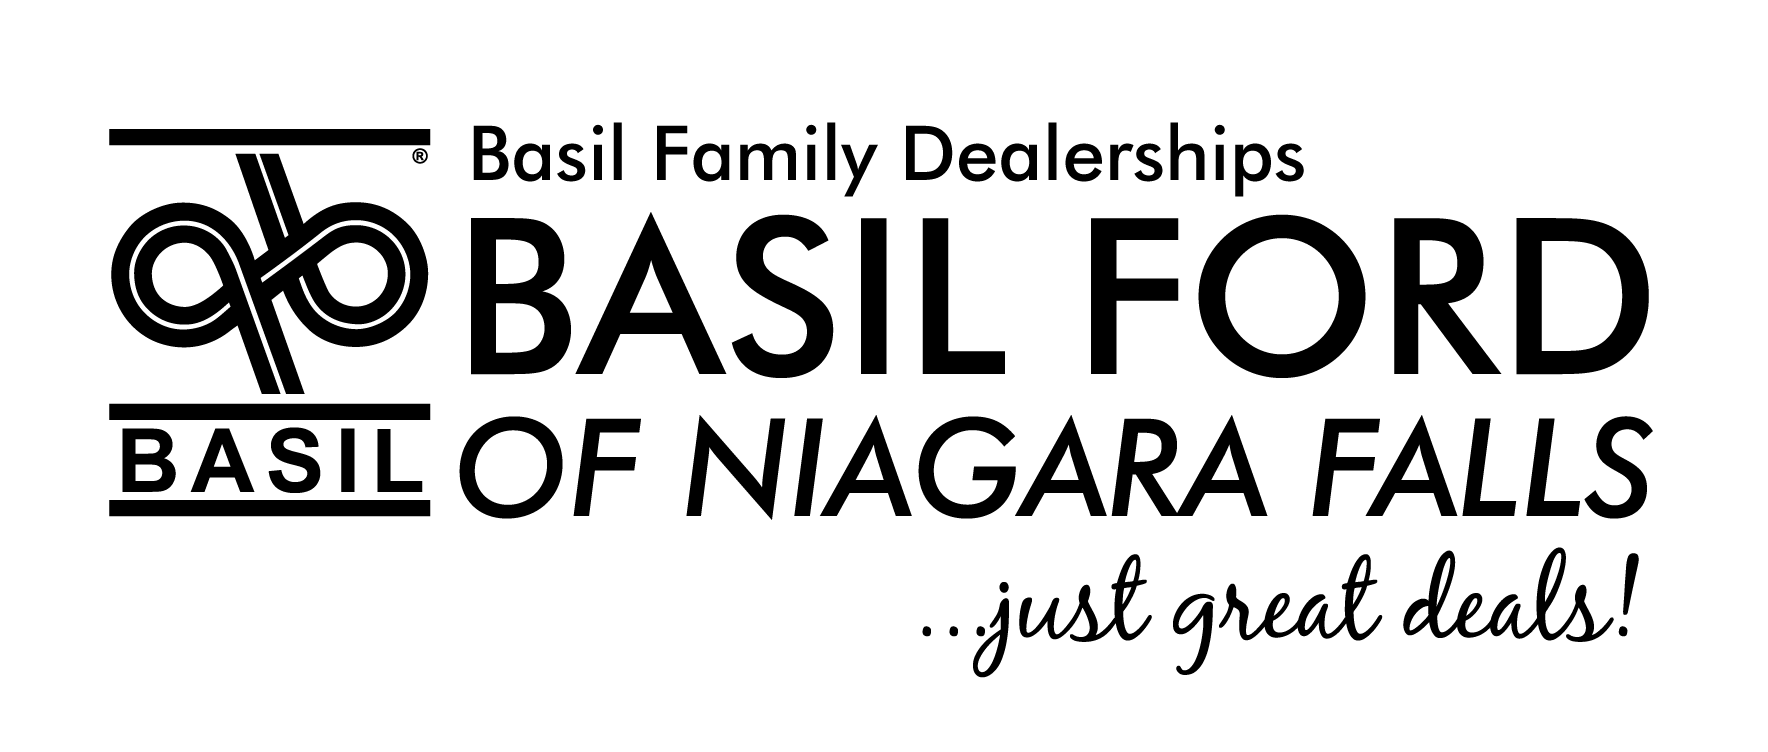 bnf-black